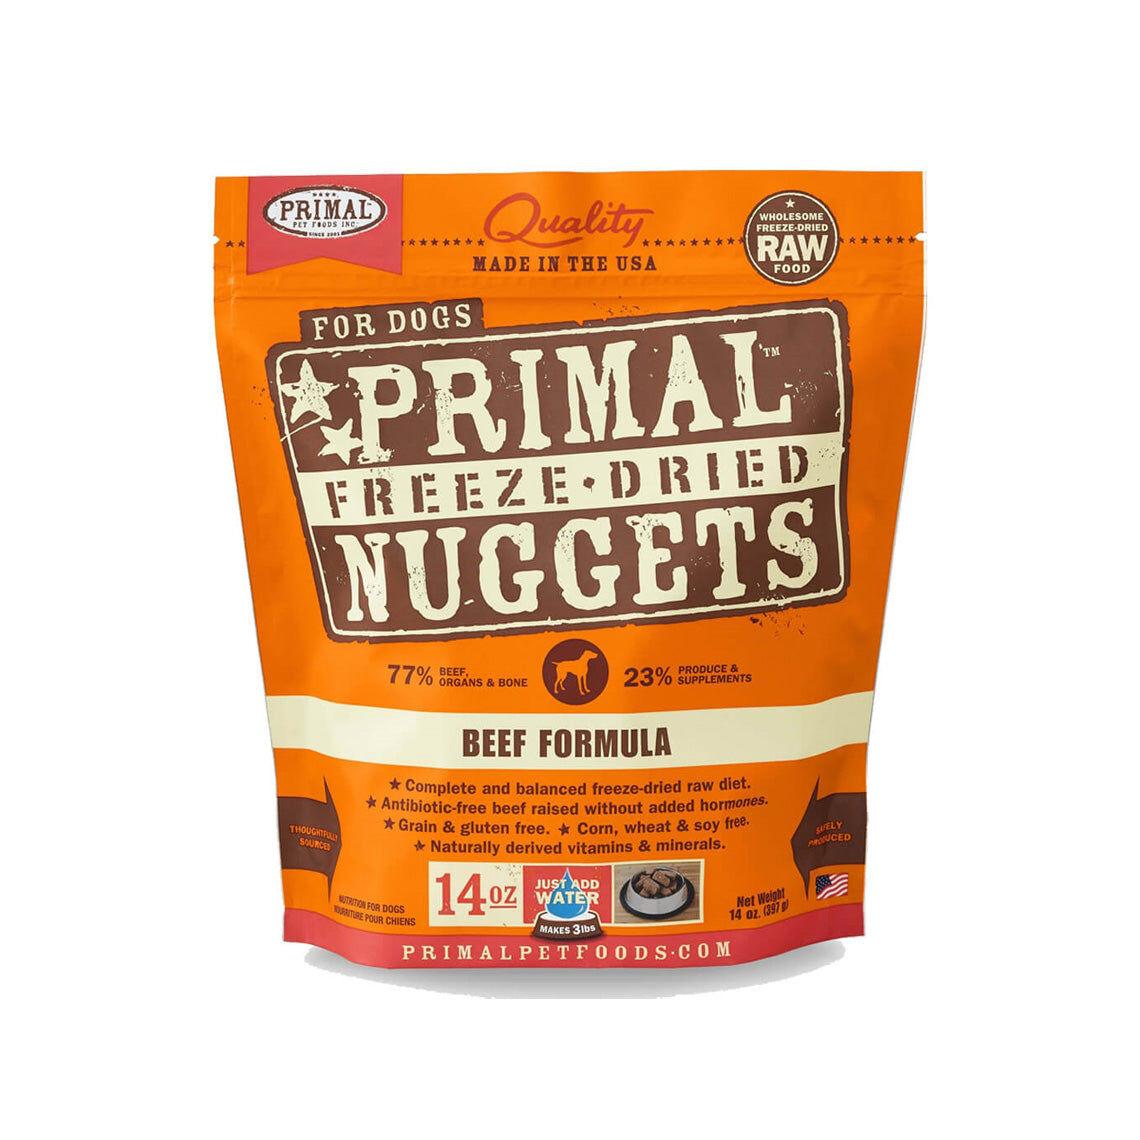 Primal Pet Foods Freeze-Dried Nuggets Dog Food